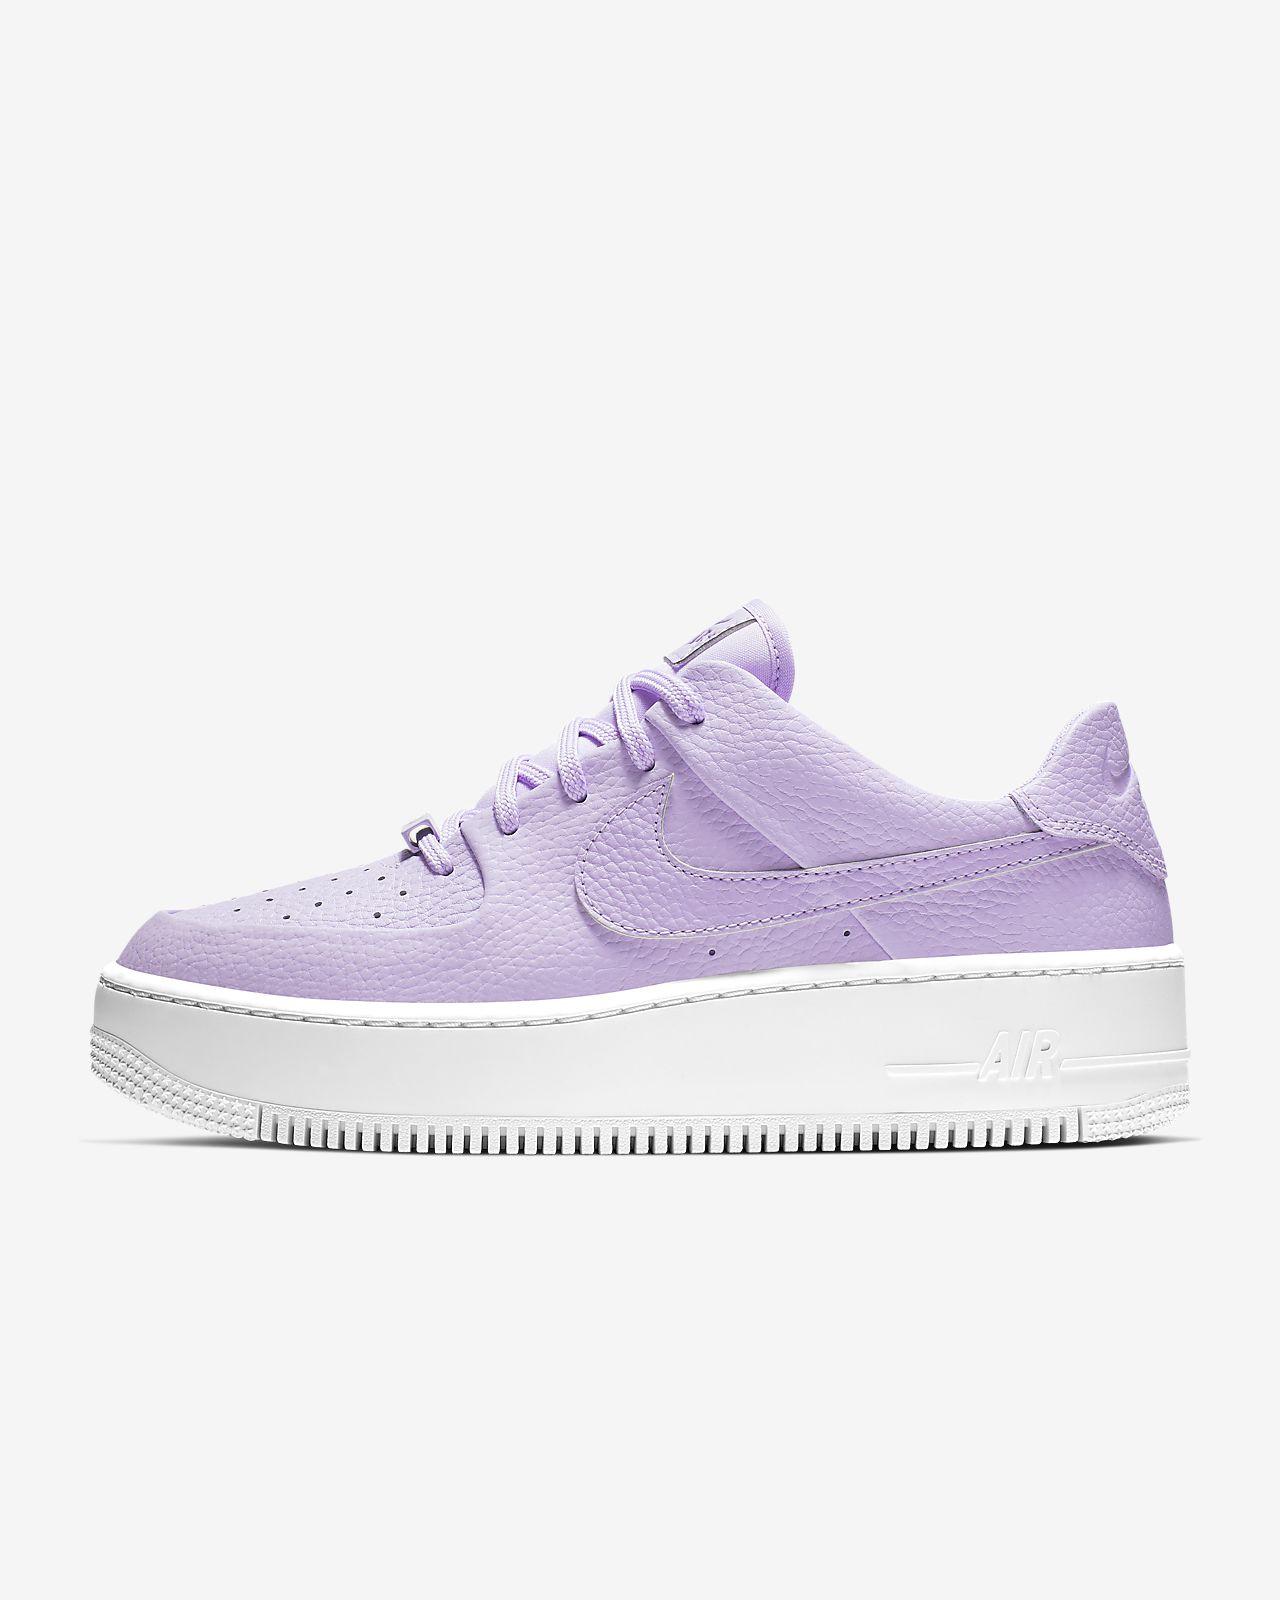 Nike Air Force 1 Sage Low Kadın Ayakkabısı